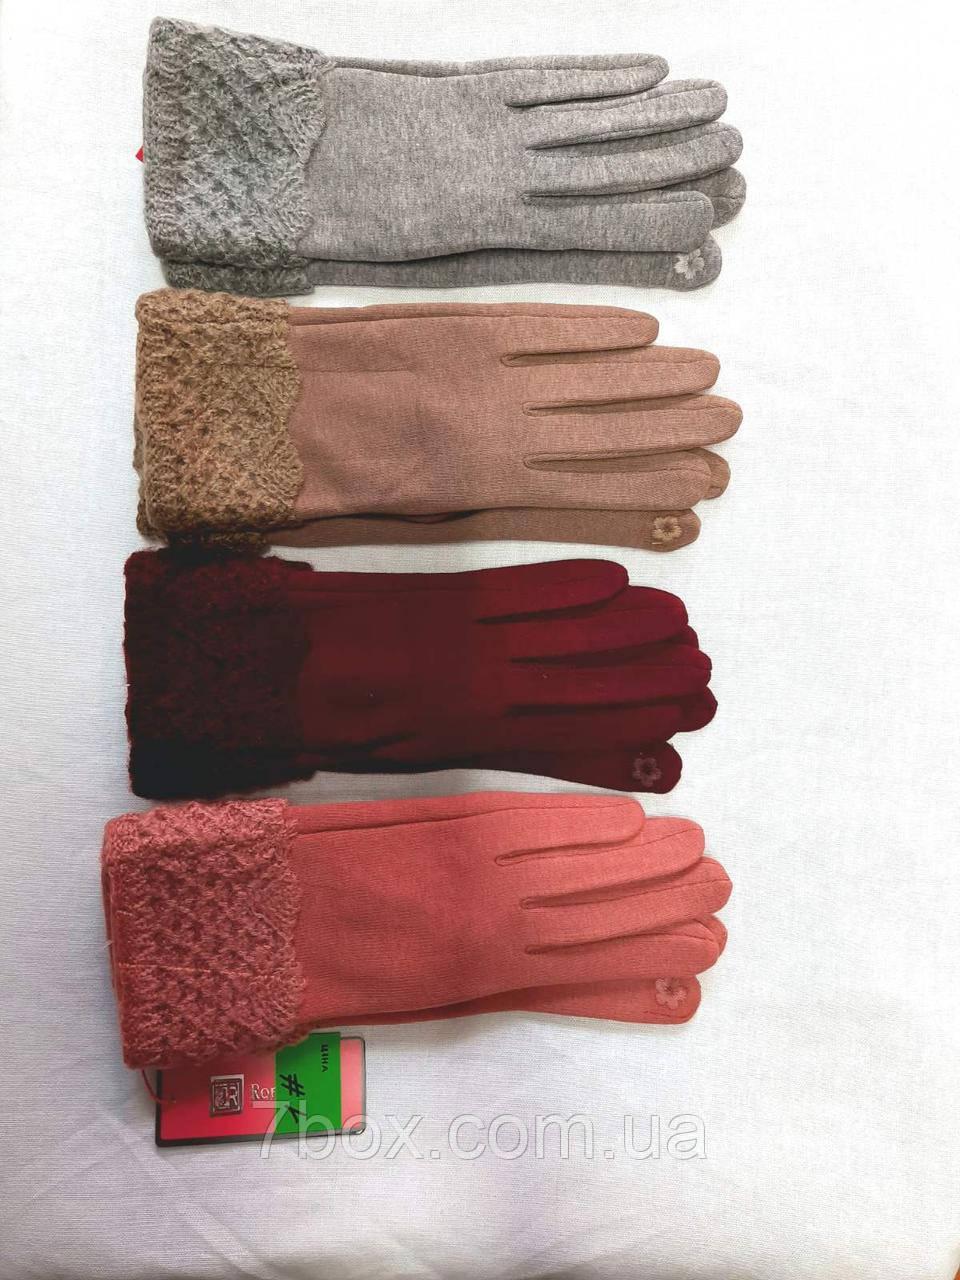 Перчатки сенсор женские Трикотаж оптом вязанка 12 шт